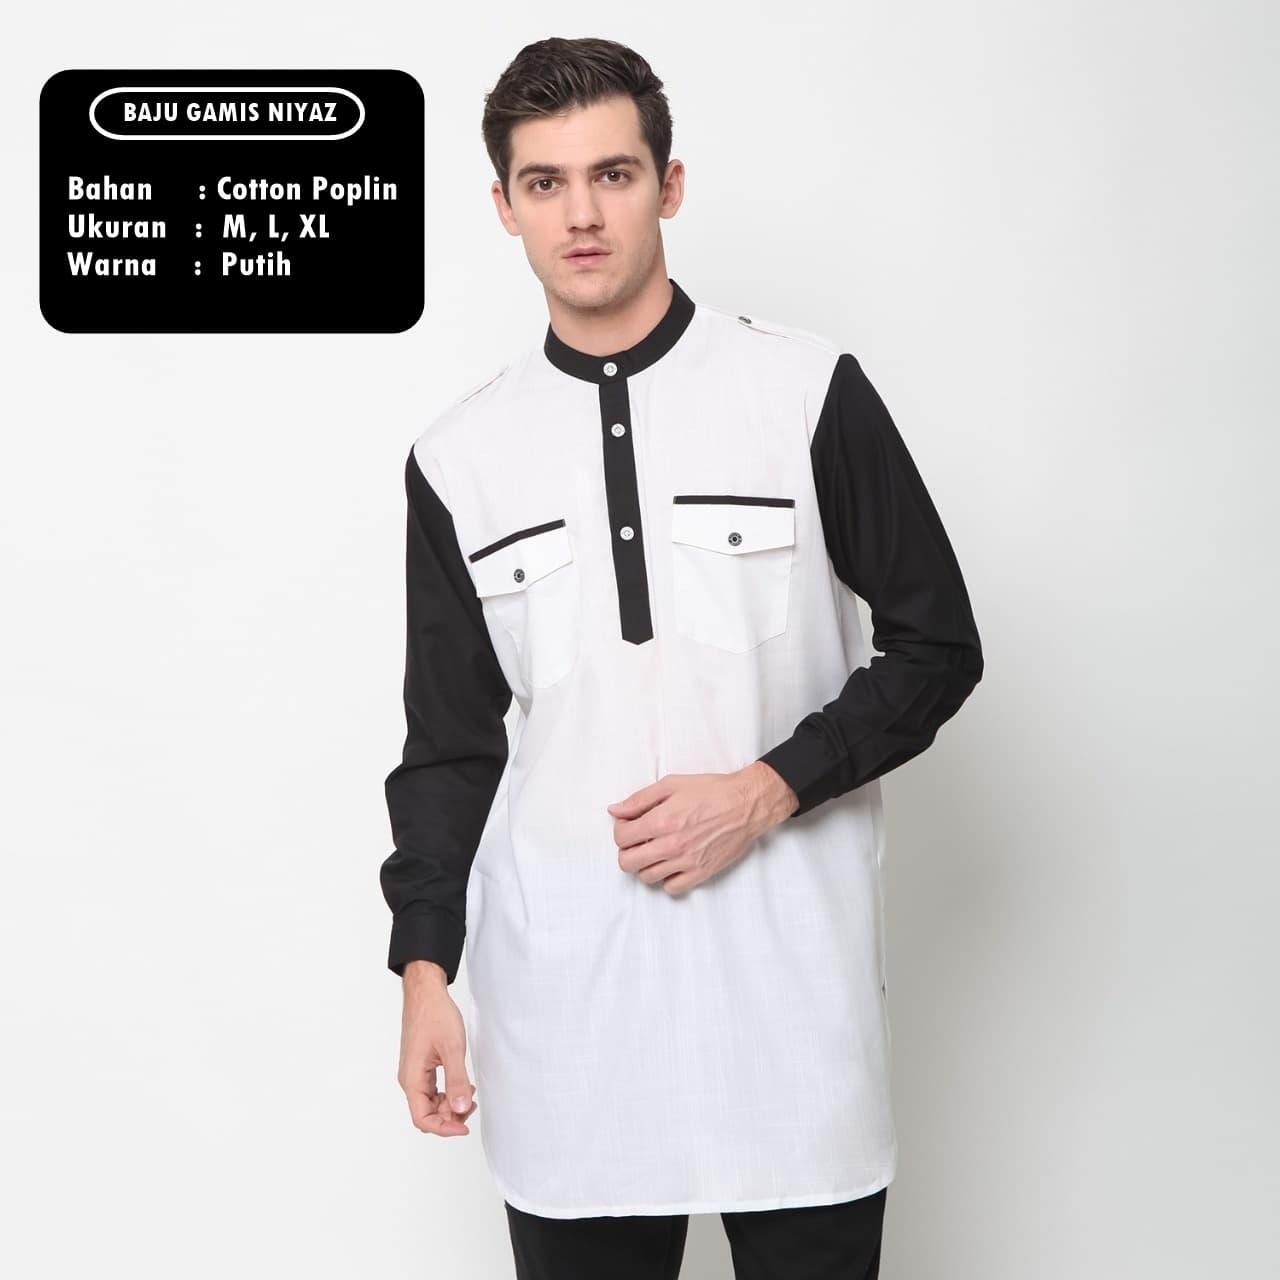 Baju Koko Gamis Niyaz - Zayidan Putih